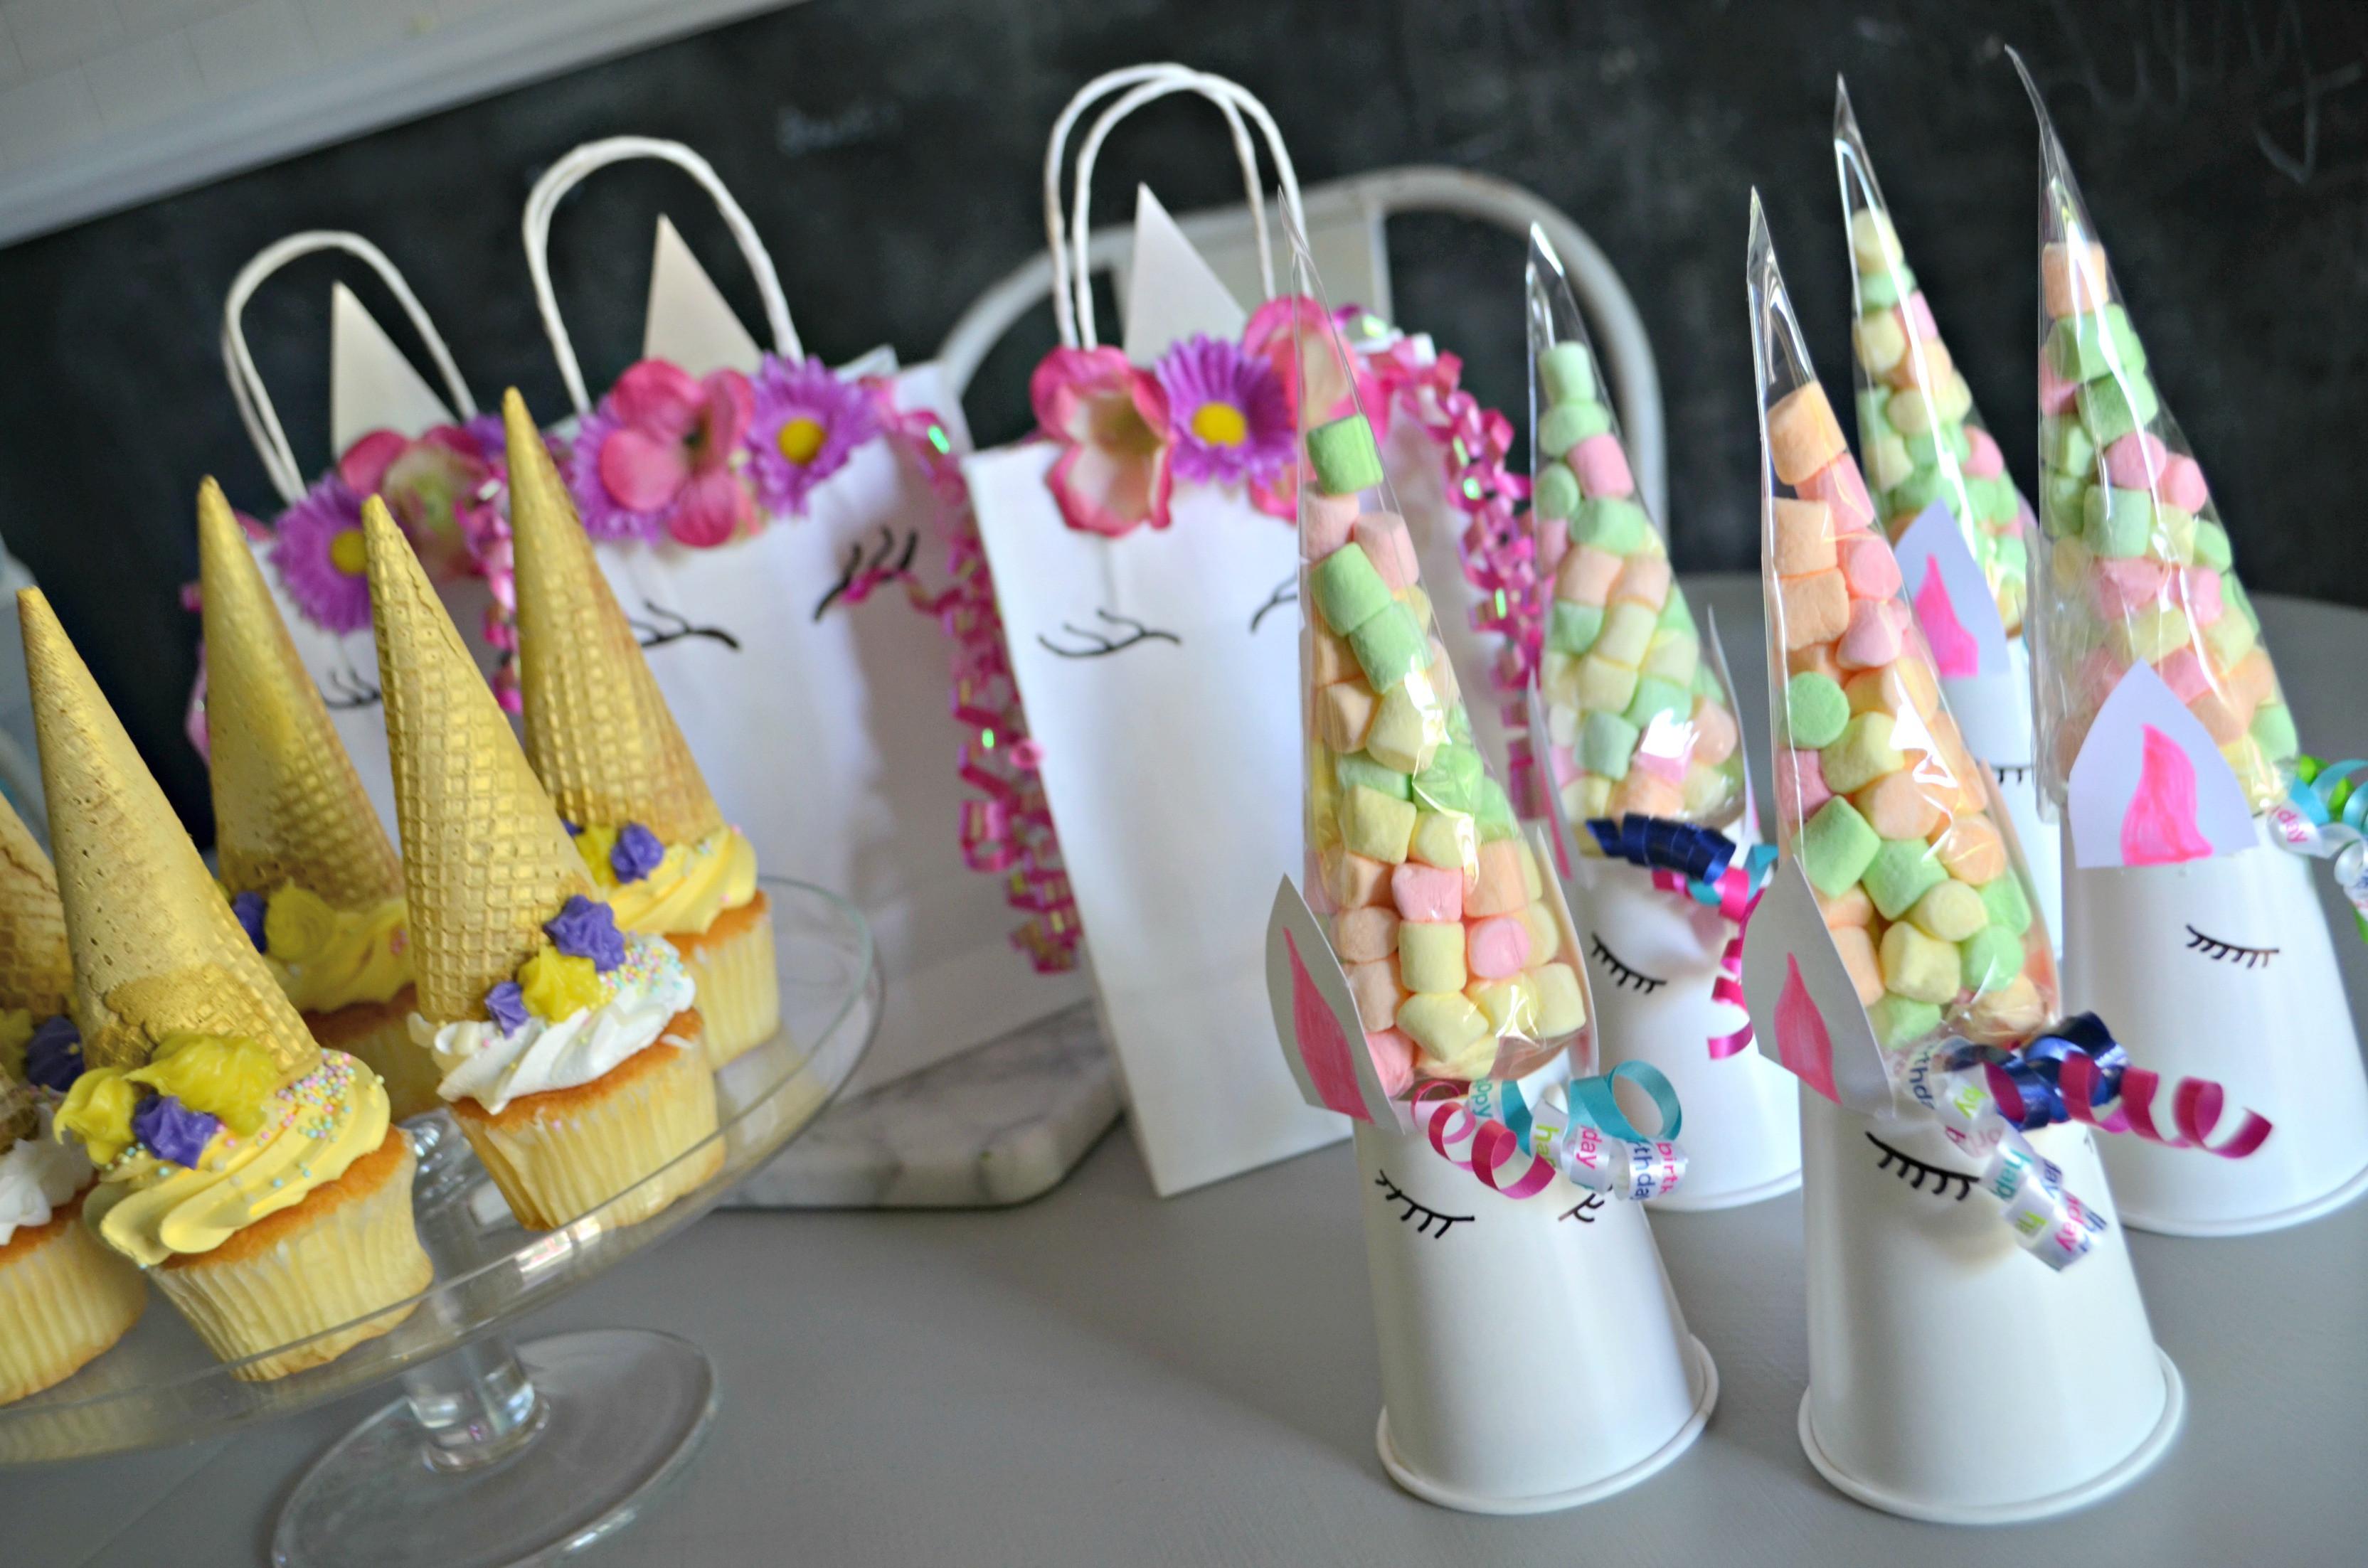 Diy Unicorn Party Ideas  Make These 3 Frugal Cute and Easy DIY Unicorn Birthday